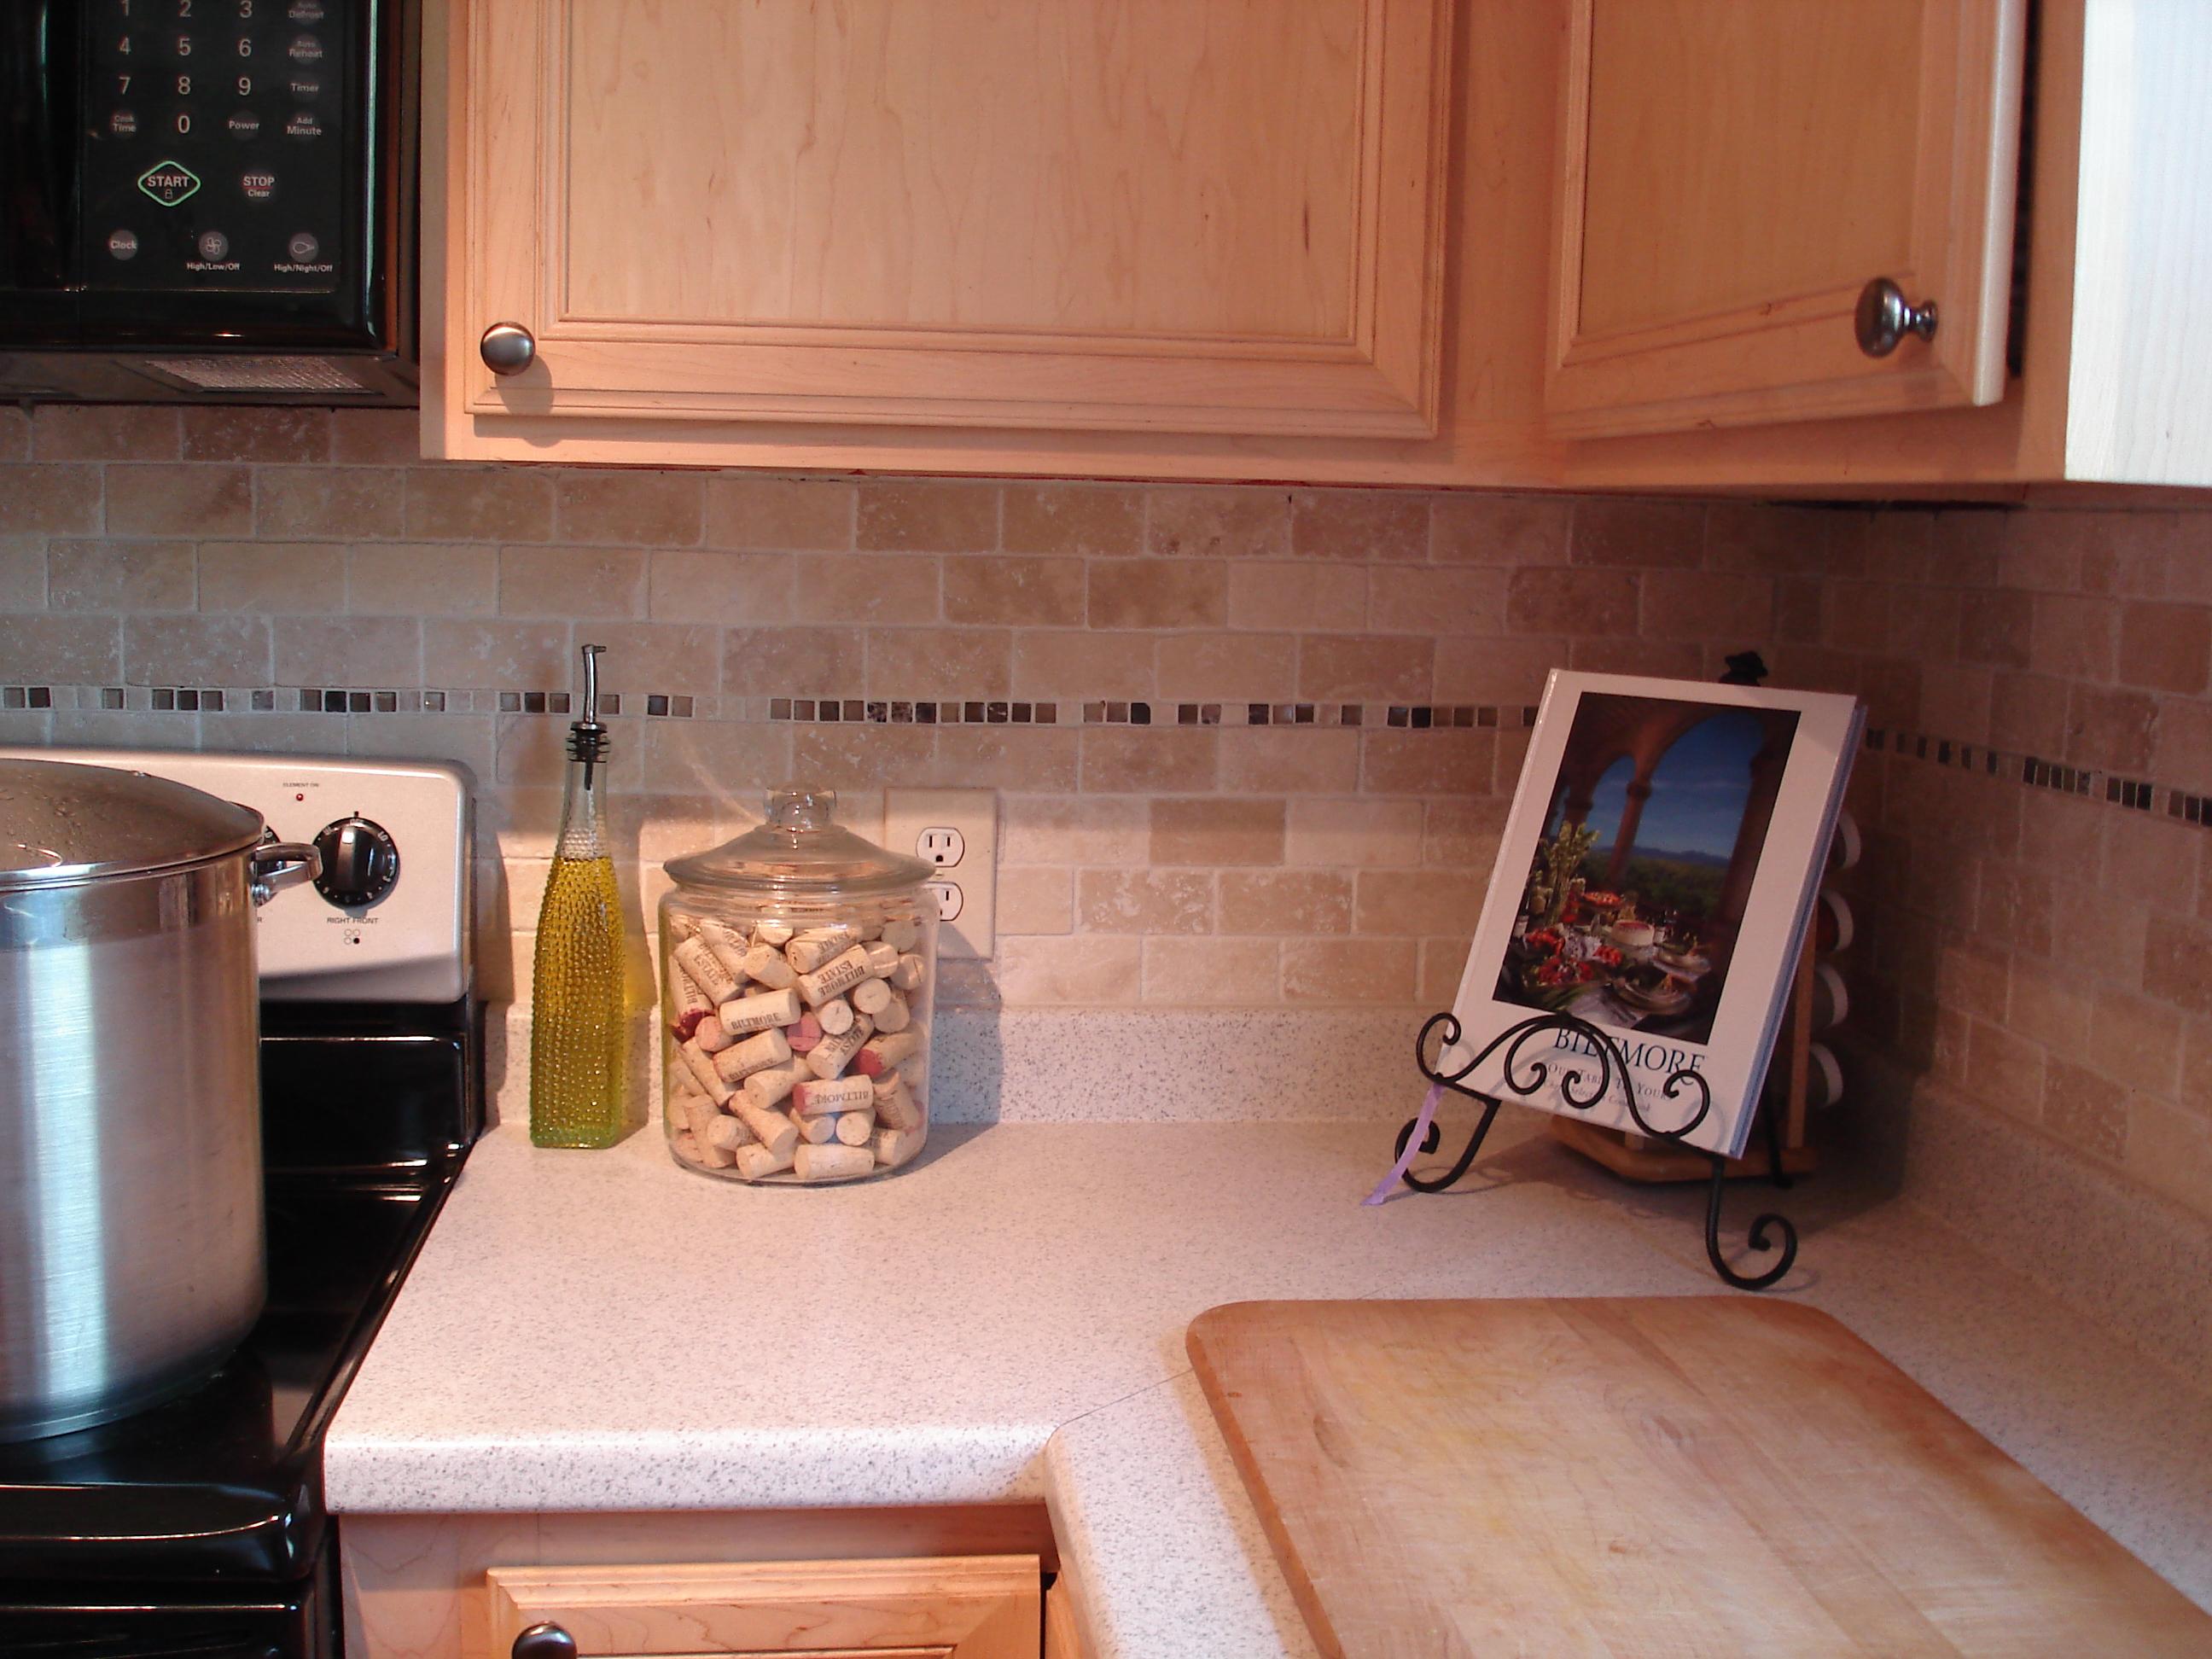 tutorial tile kitchen back splash backsplashes for kitchen Tutorial Tile Kitchen Back Splash